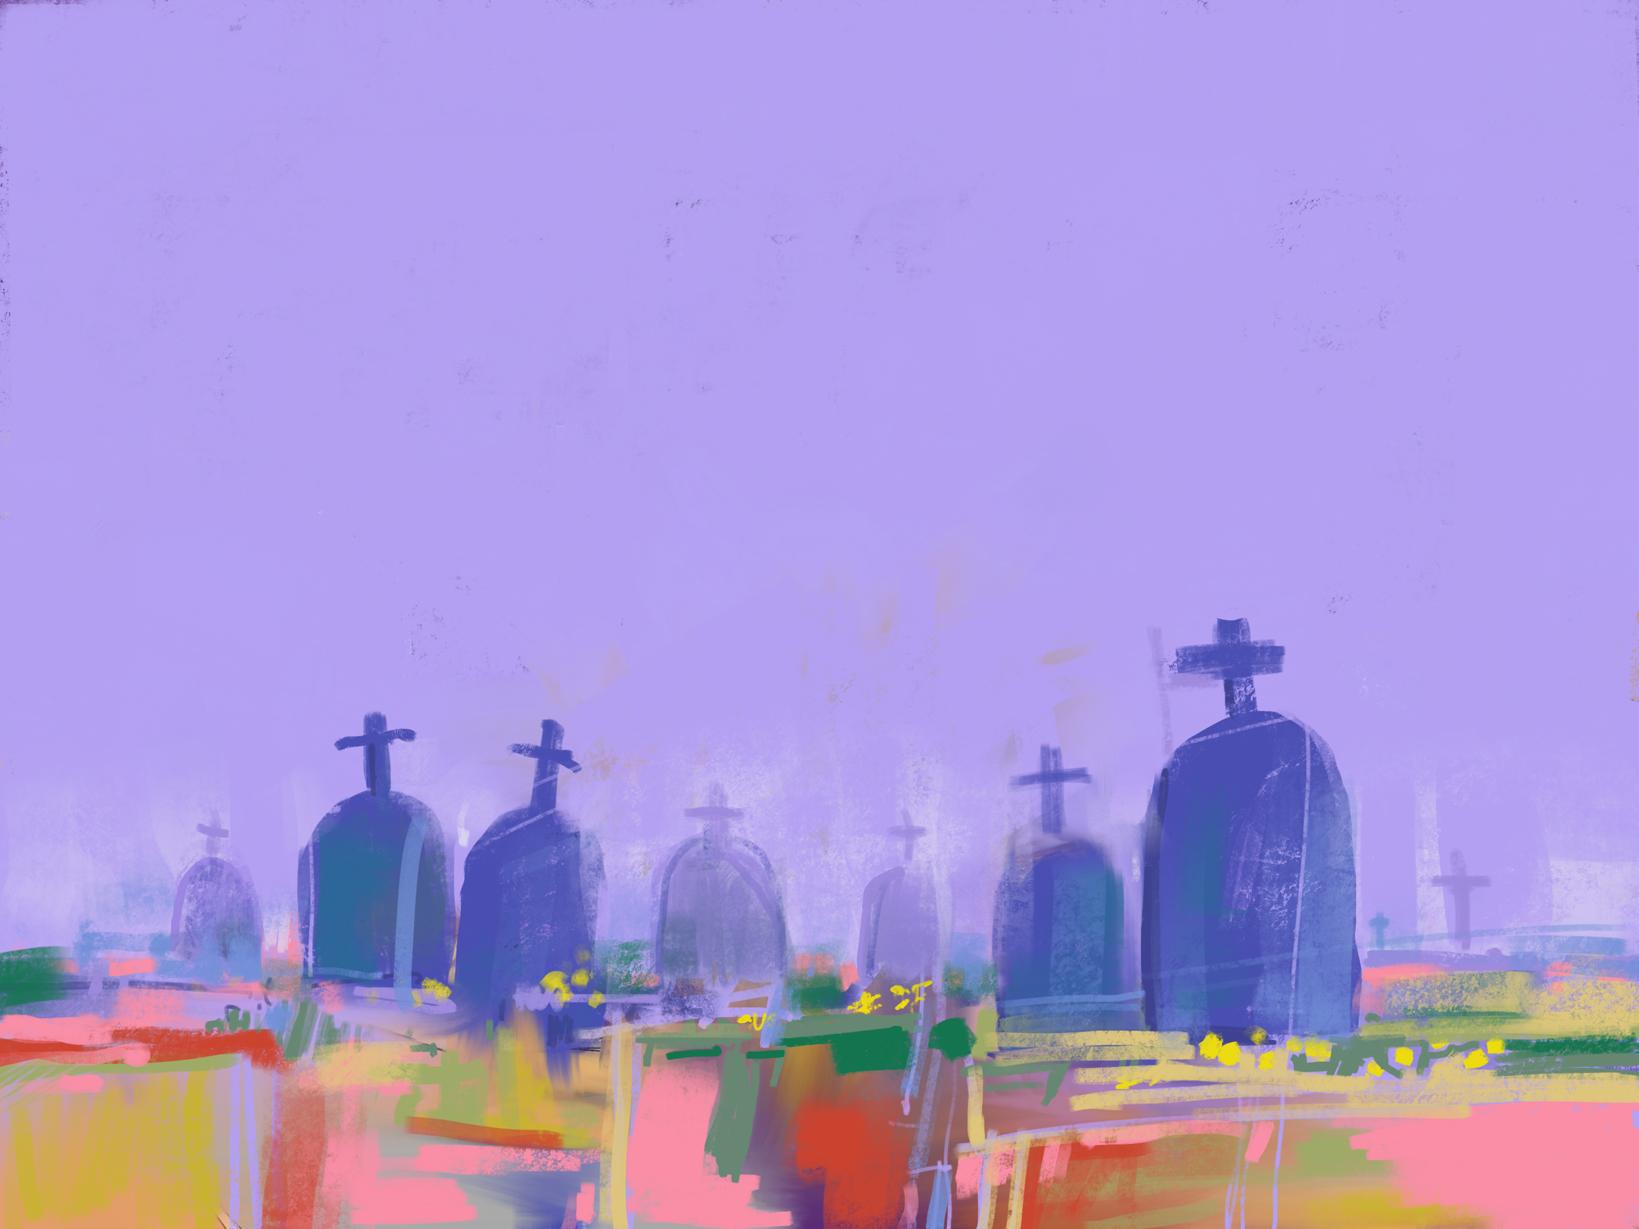 Cemetery-DAY_4x3.jpg